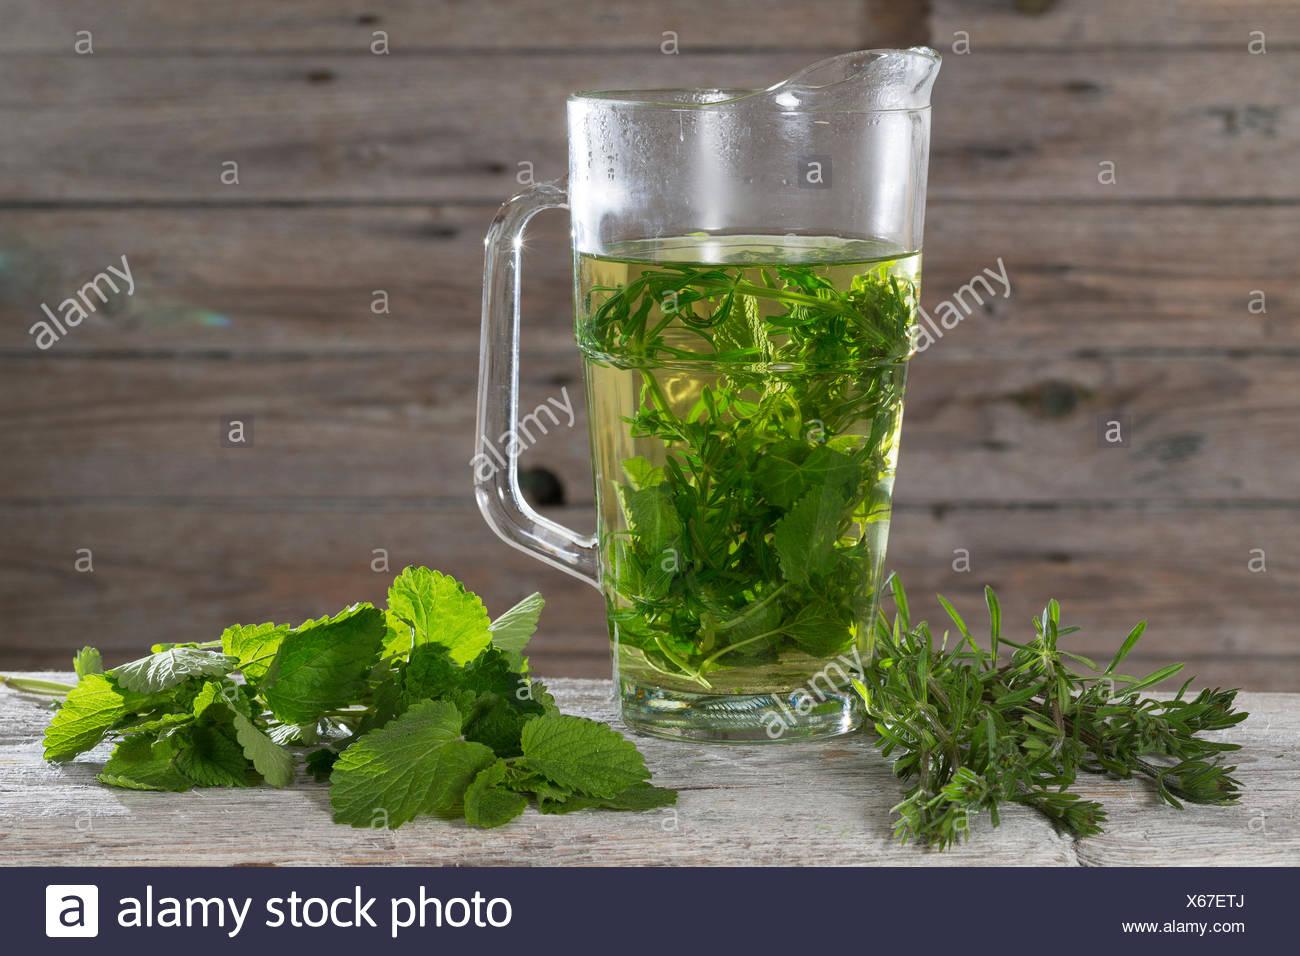 Lemon balm, Garden balm (Melissa officinalis), tea from lemon balm and goosegrass, Germany Stock Photo